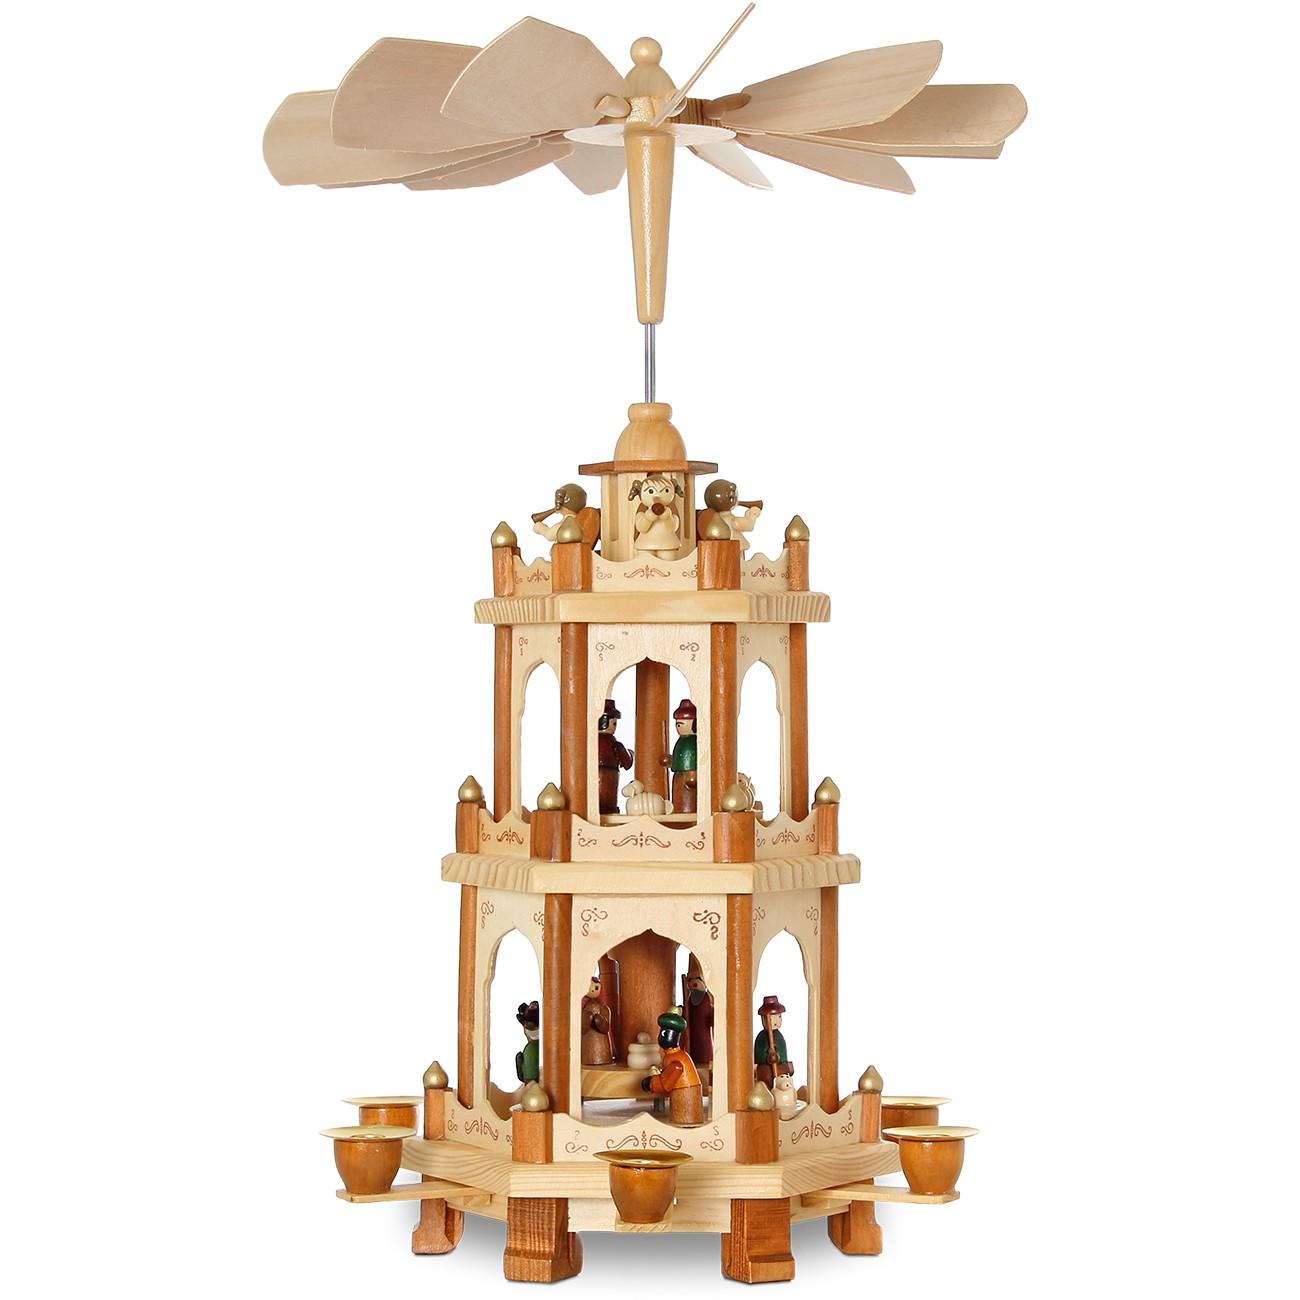 sikora p20 klassische holz weihnachtspyramide 3 etagen ebay. Black Bedroom Furniture Sets. Home Design Ideas